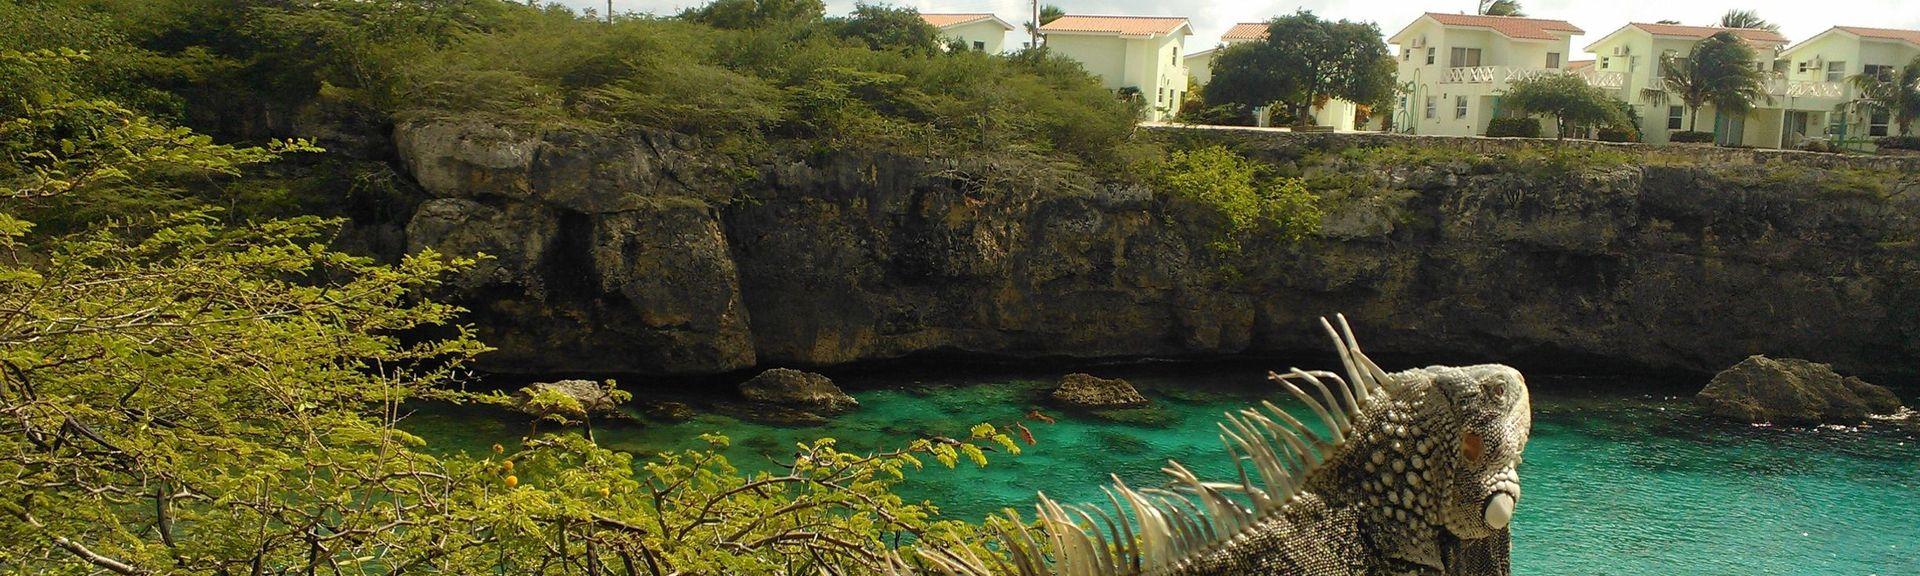 Lagun, Curaçao